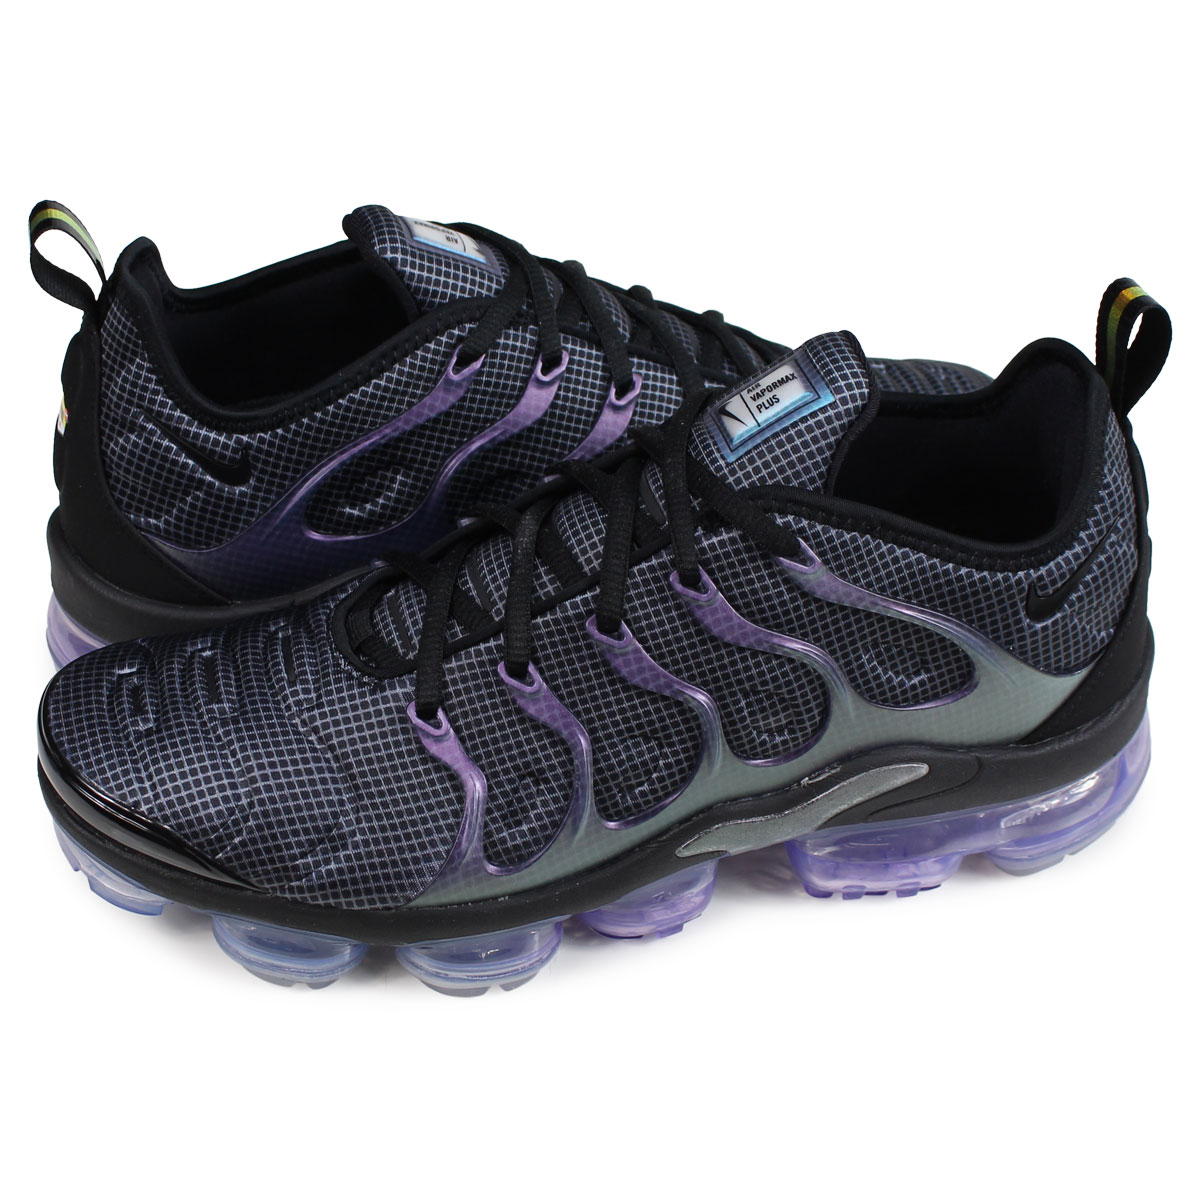 4cacc6c2e97a34 Nike NIKE air vapor max plus sneakers men AIR VAPORMAX PLUS black 924